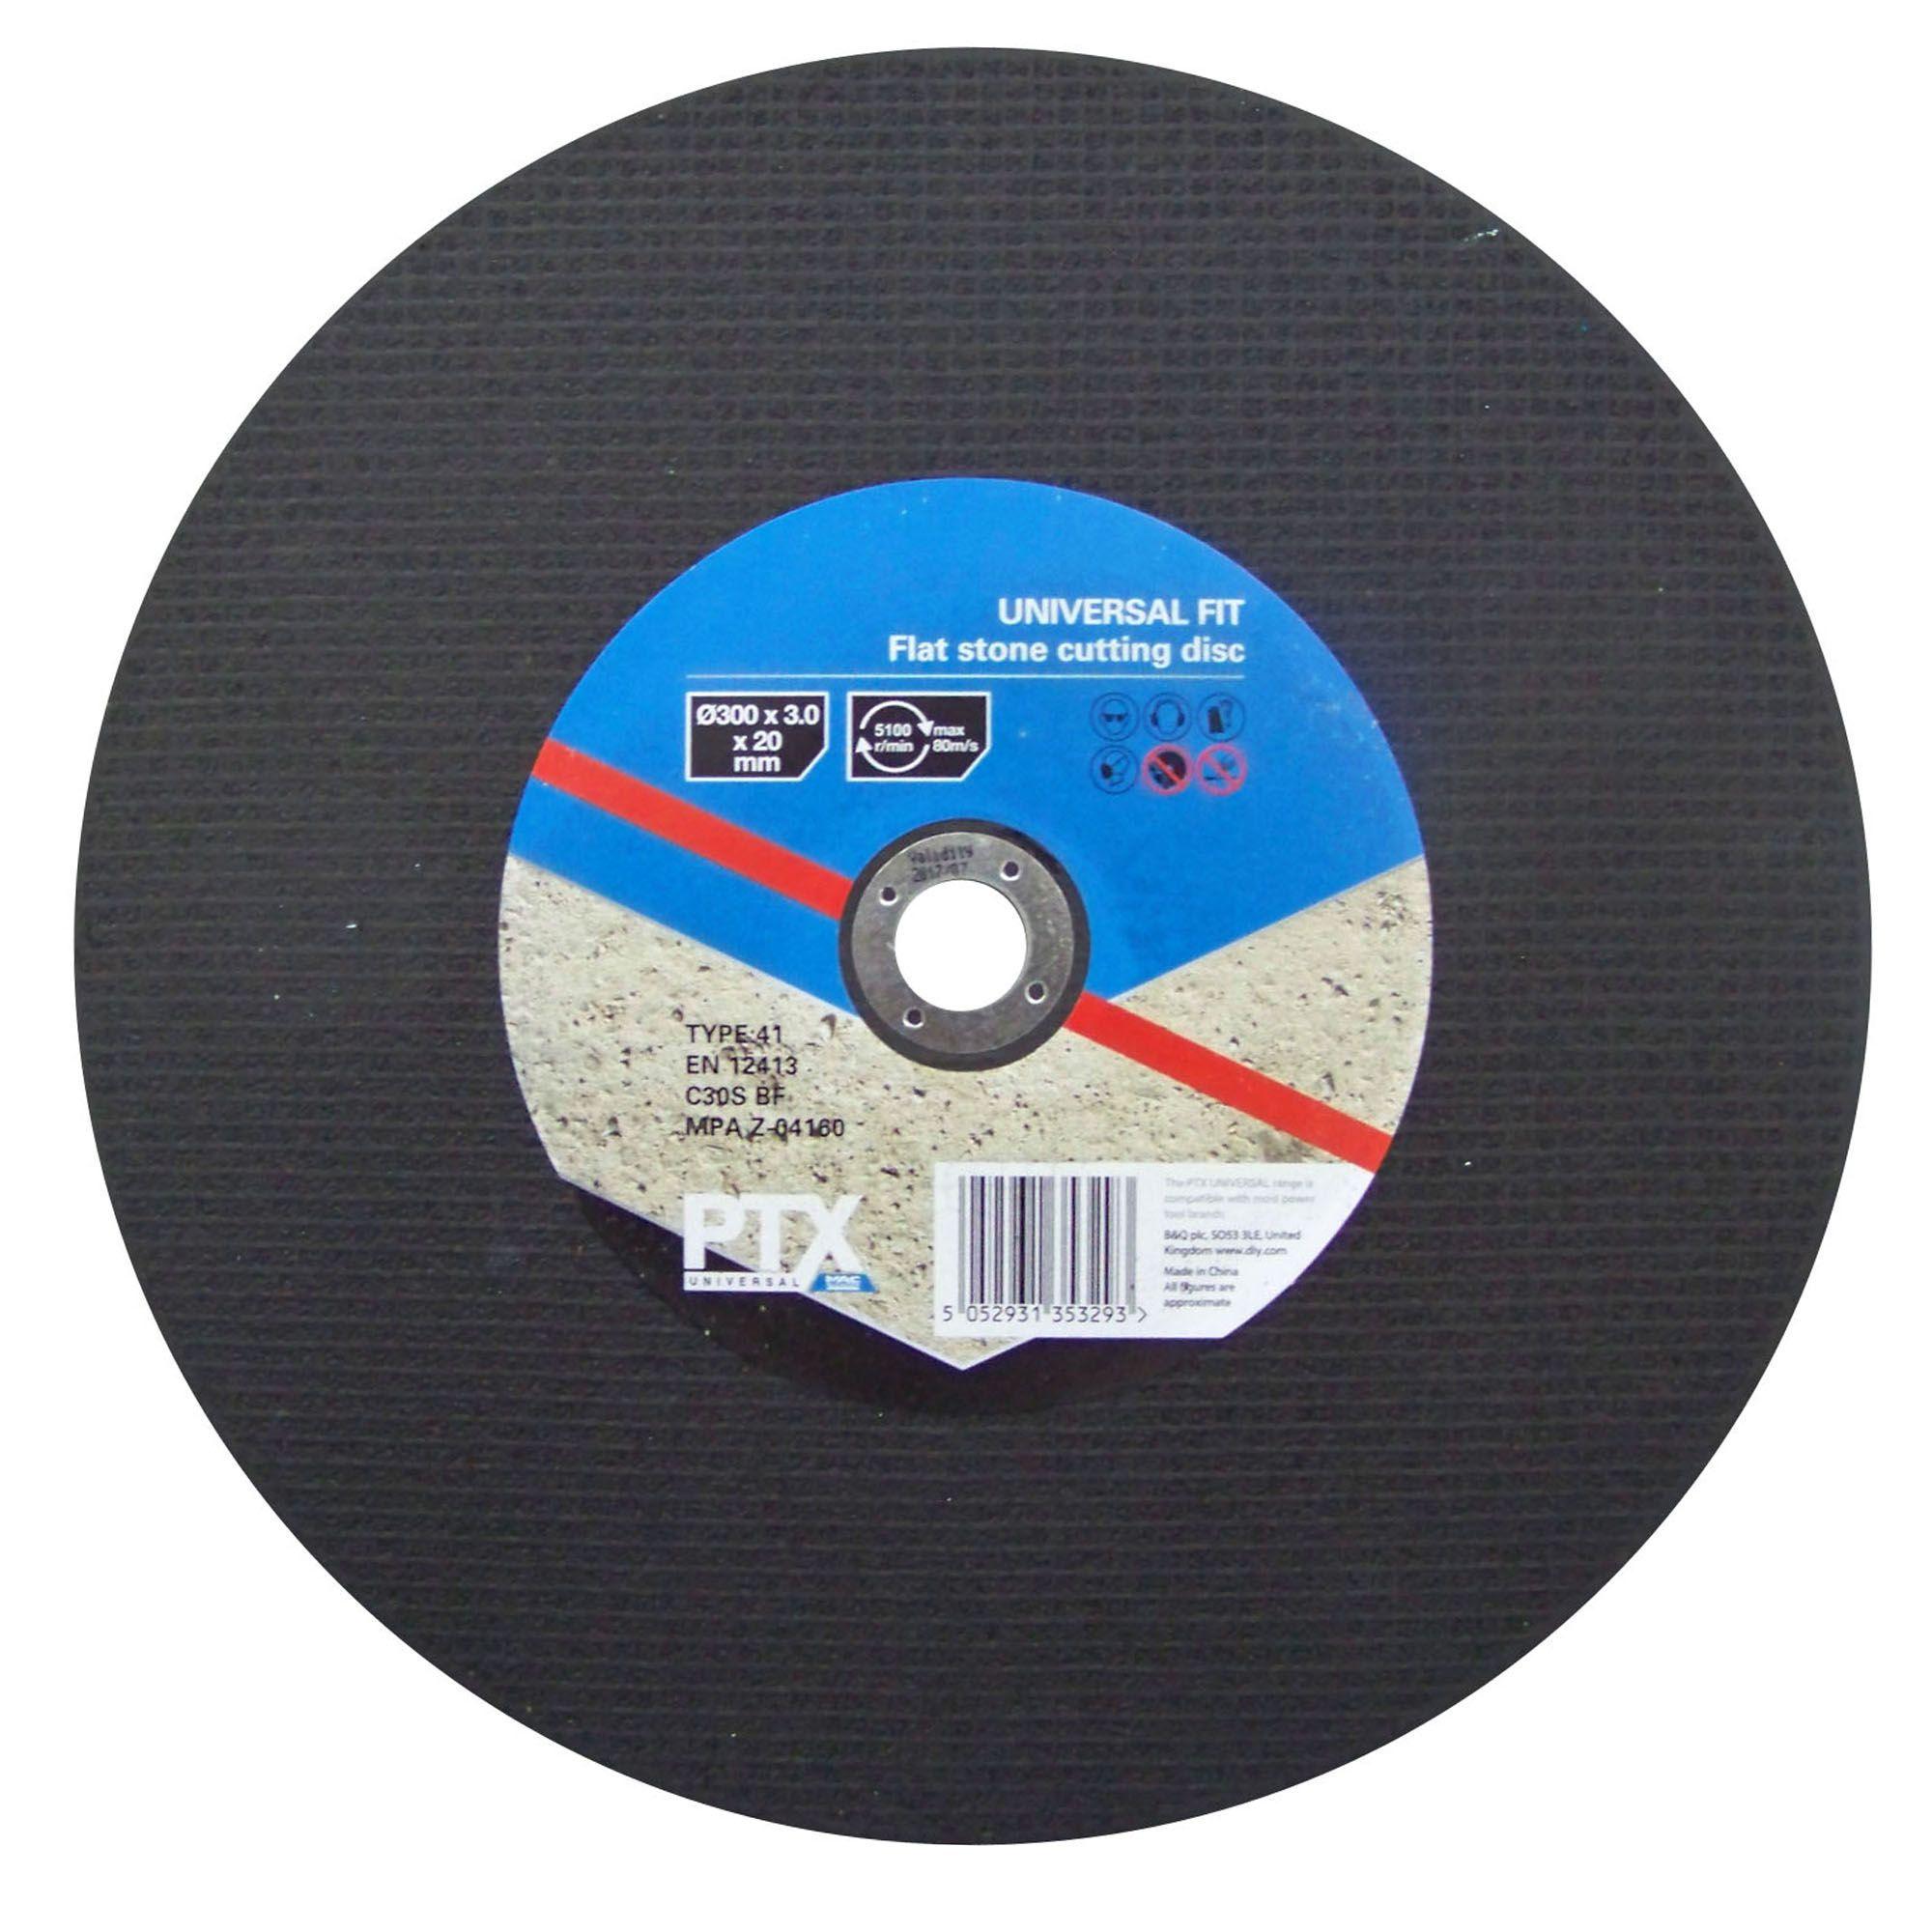 Ptx Dia 300mm Flat Stone Cutting Disc Departments